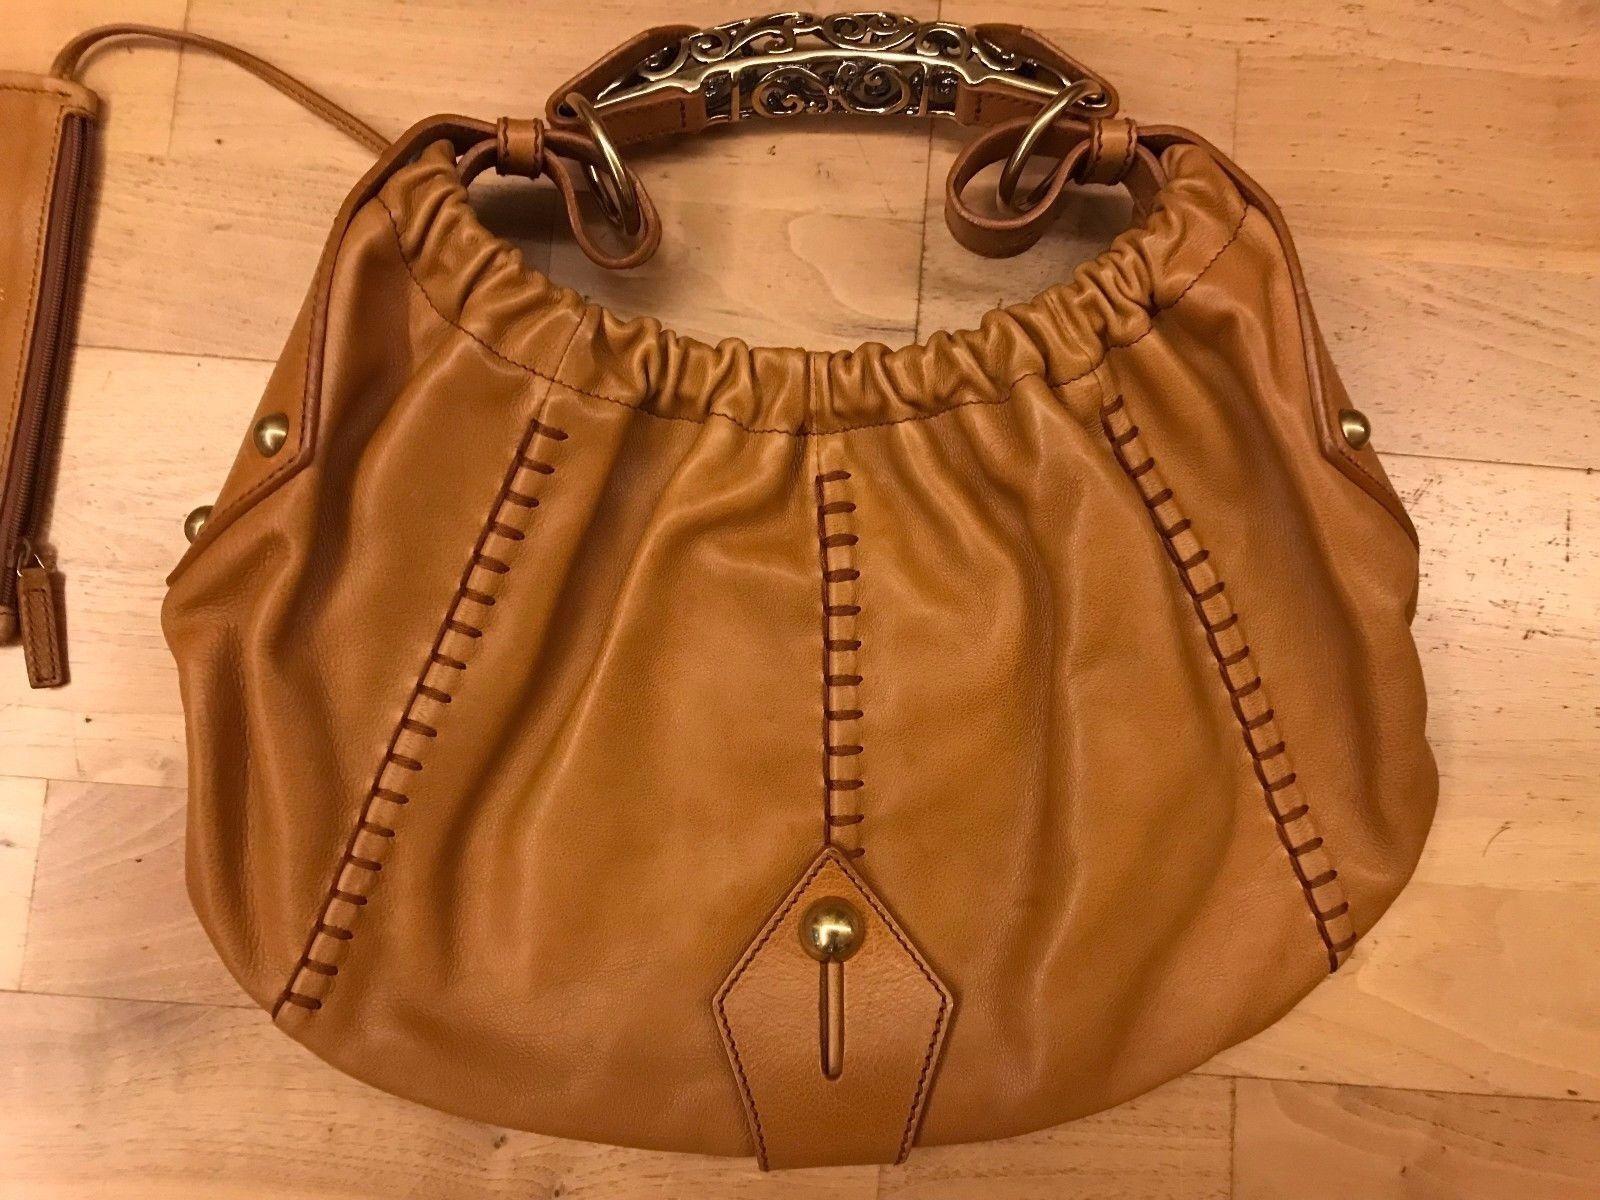 ORIGINAL YVES SAINT LAURENT Handtasche Damen Tasche COGNAC Farbe